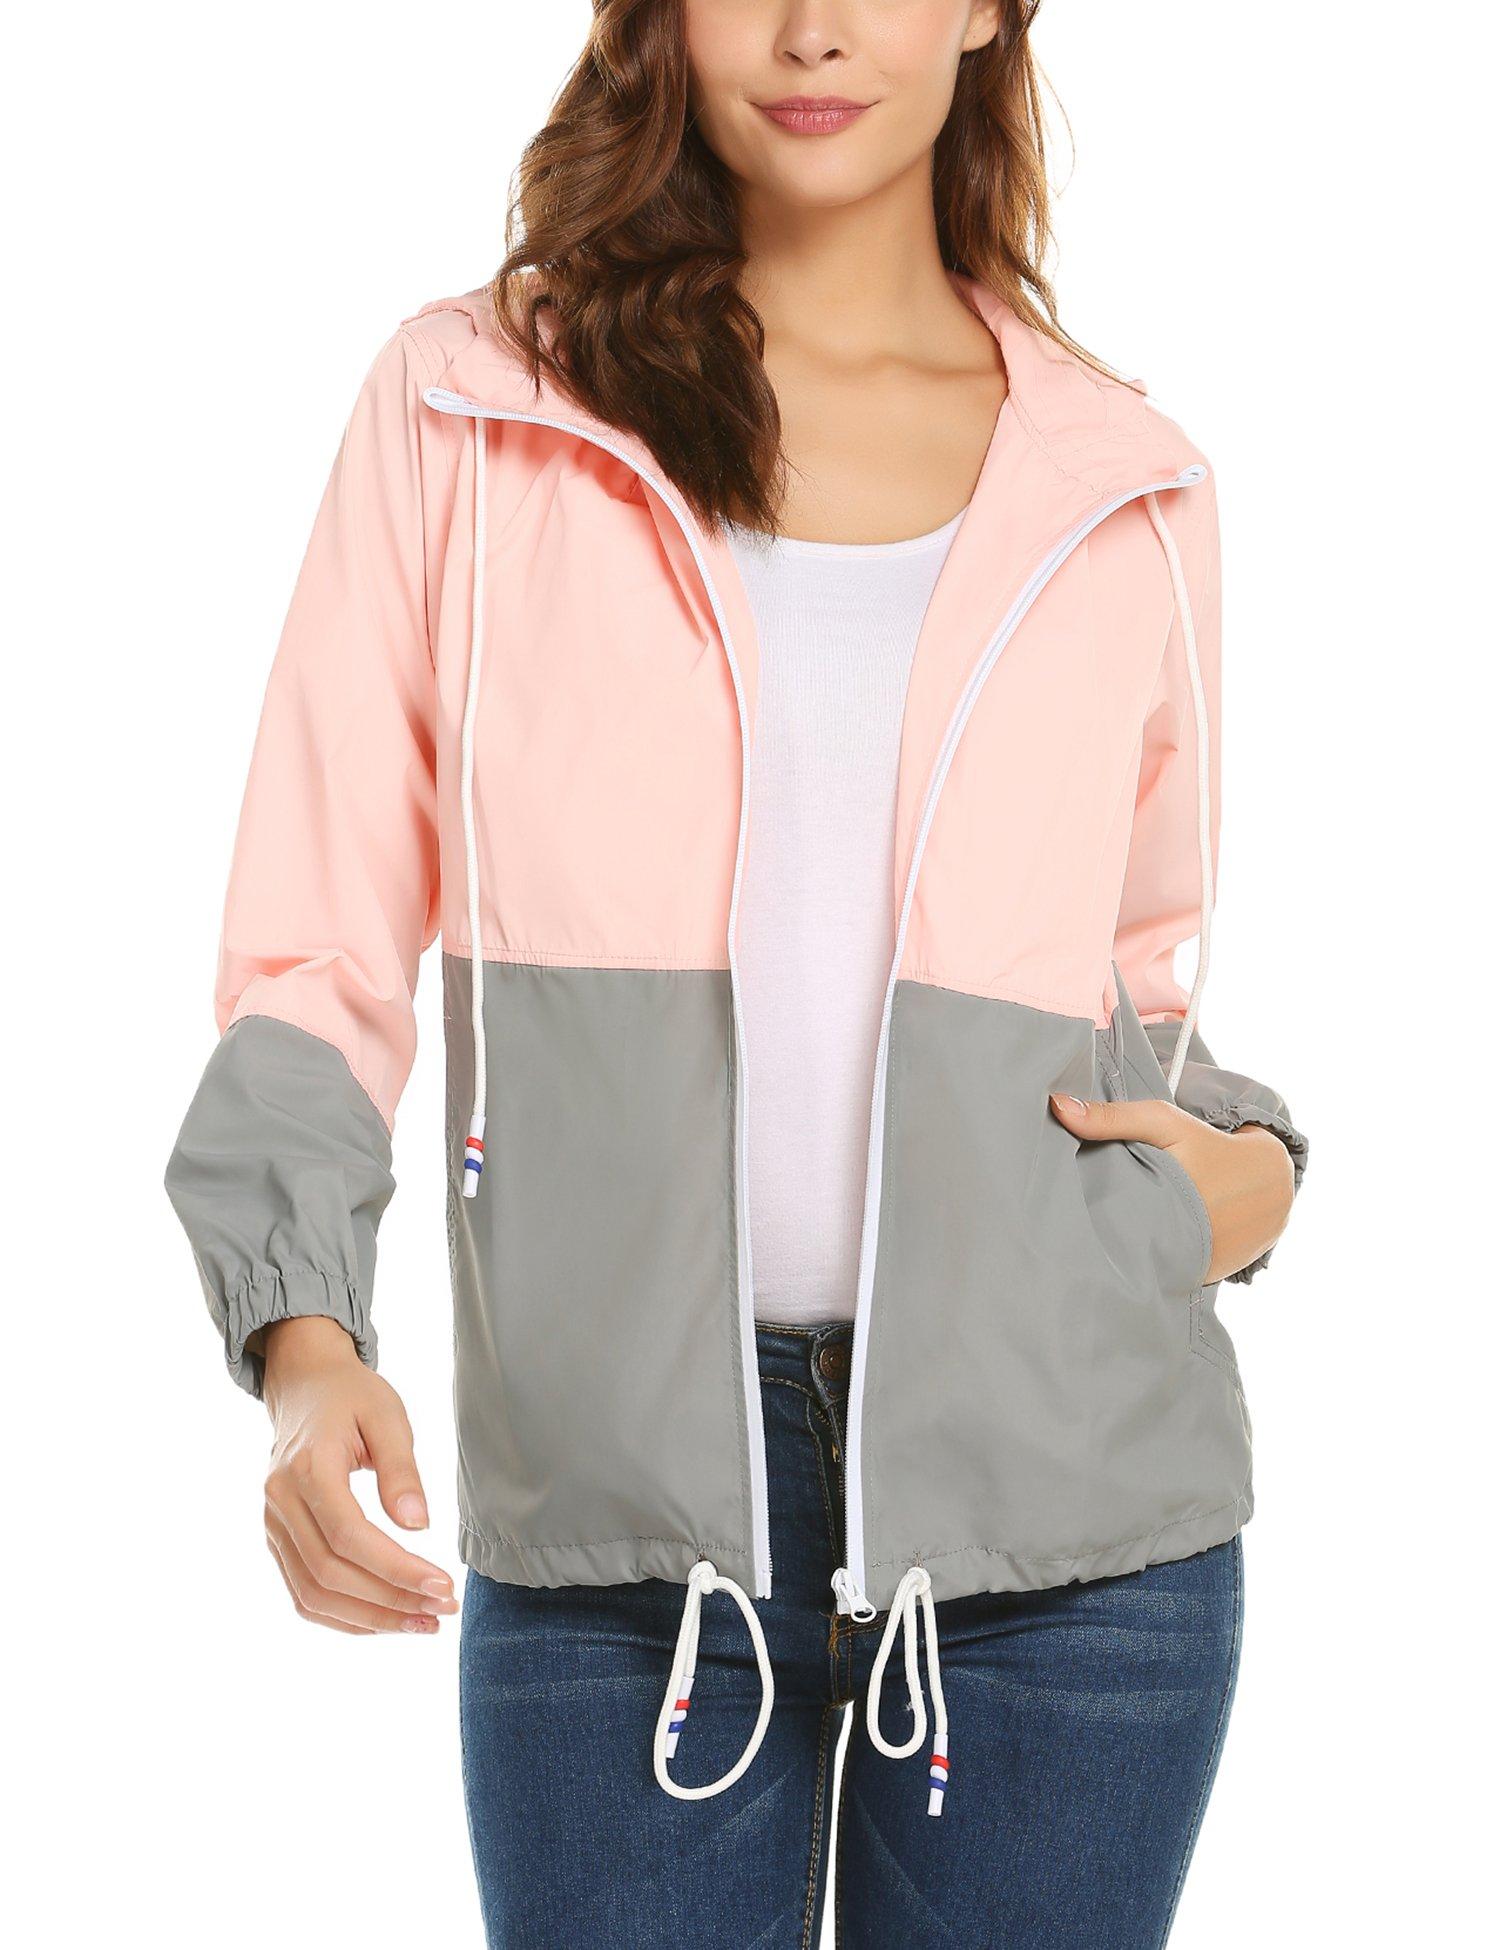 ZHENWEI Women's Lightweight Raincoat Zip up Casual Hoodie Rain Jacket Pink L